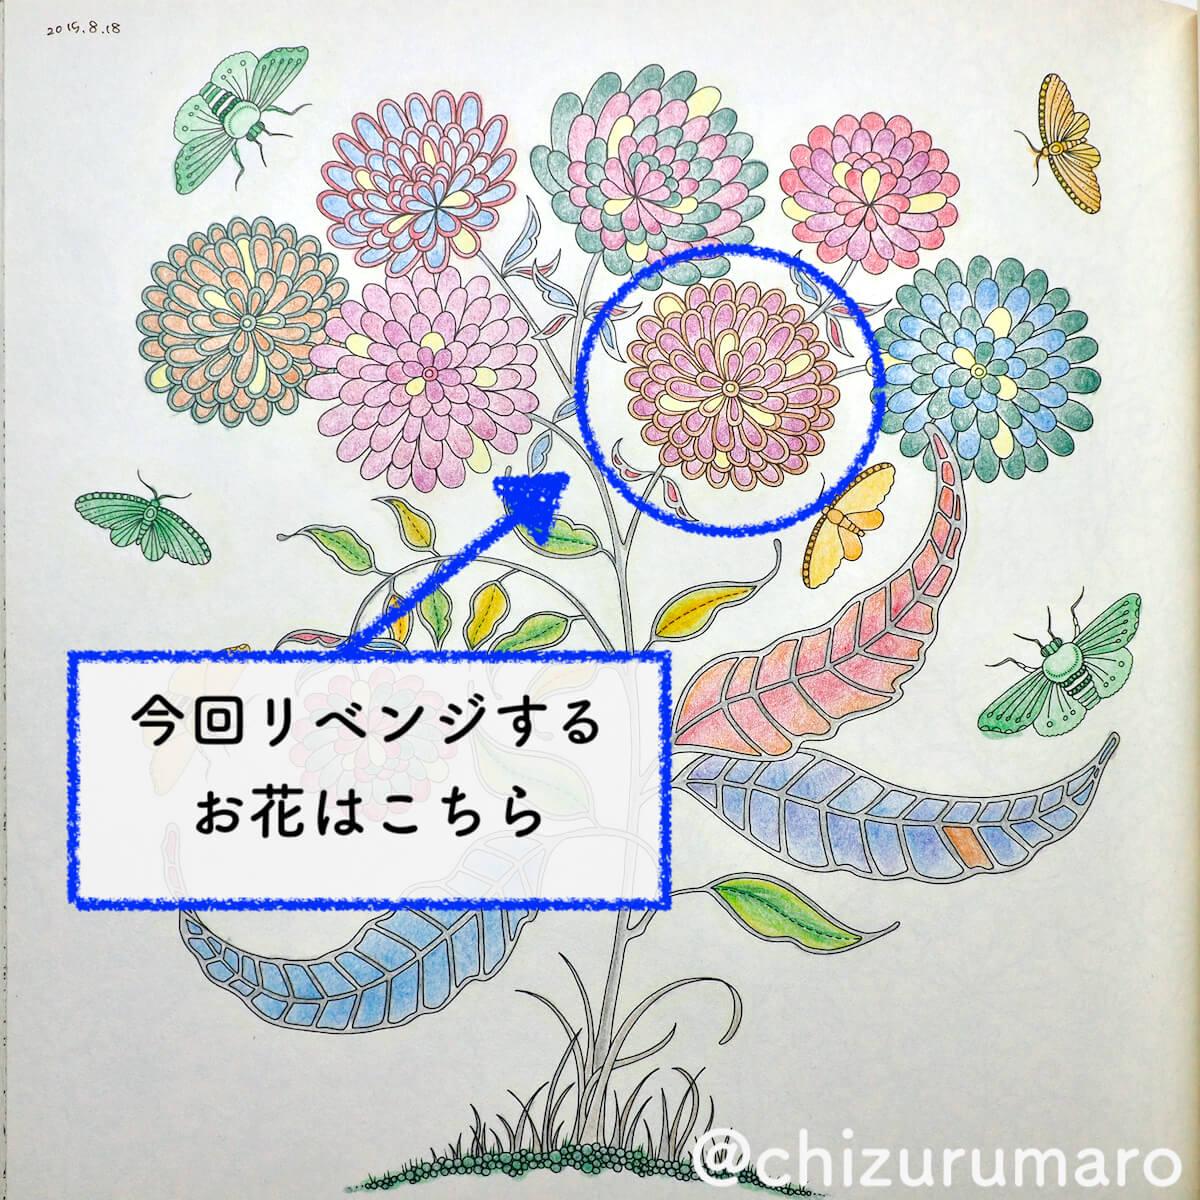 f:id:chizurumaro:20200422152234j:plain